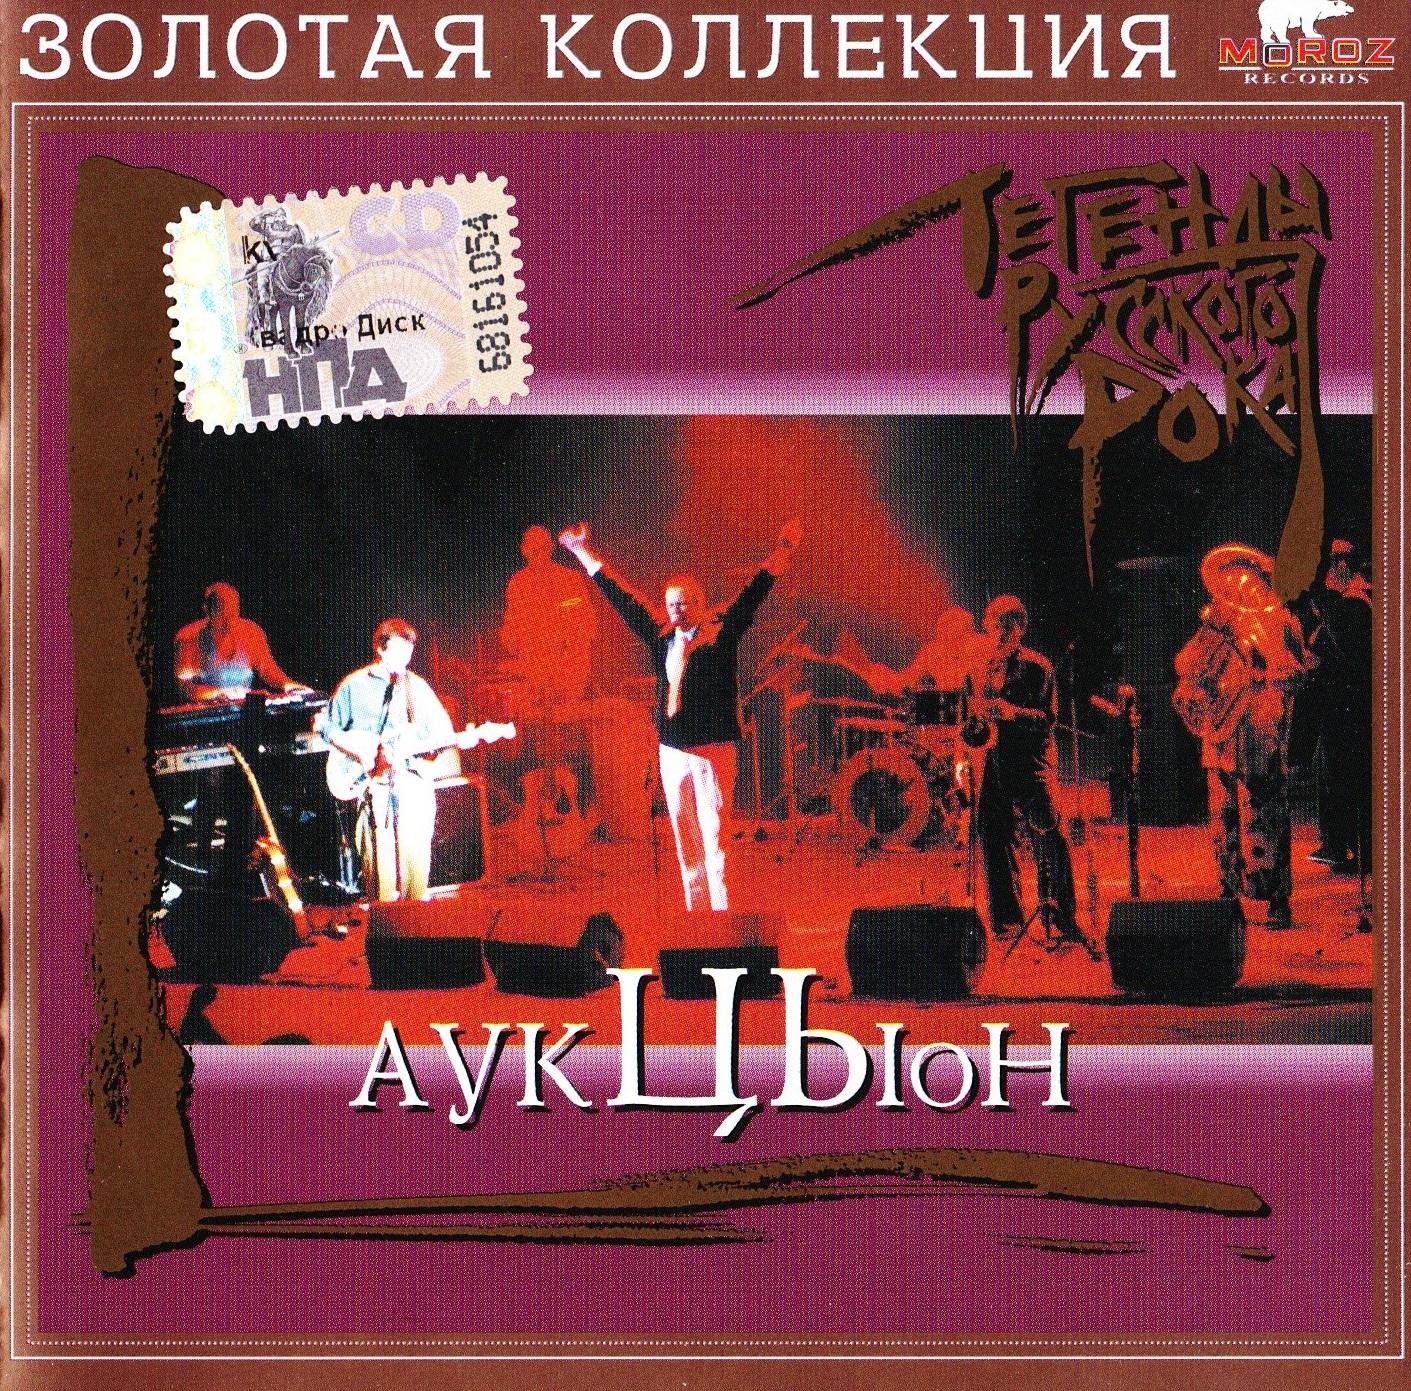 АукцЫон — Легенды Русского Рока (1999)